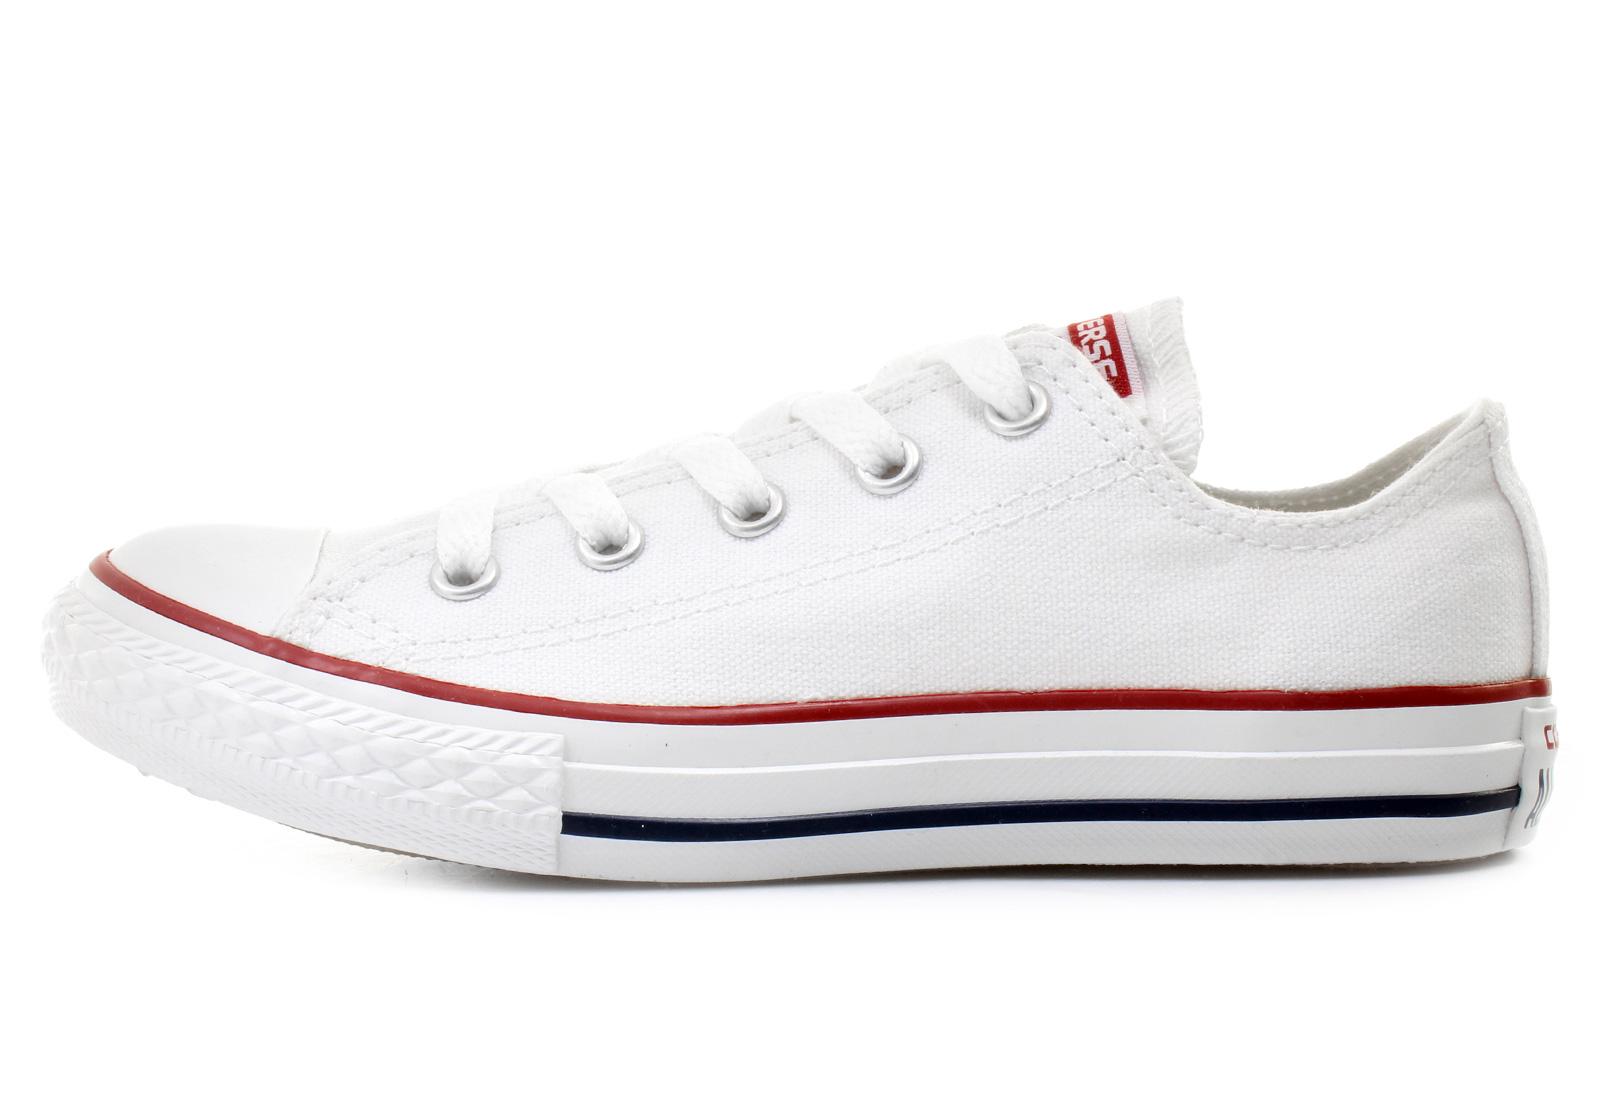 26952b2cbe Converse Tornacipő - Ct As Kids Core Ox - 3J256C - Office Shoes ...